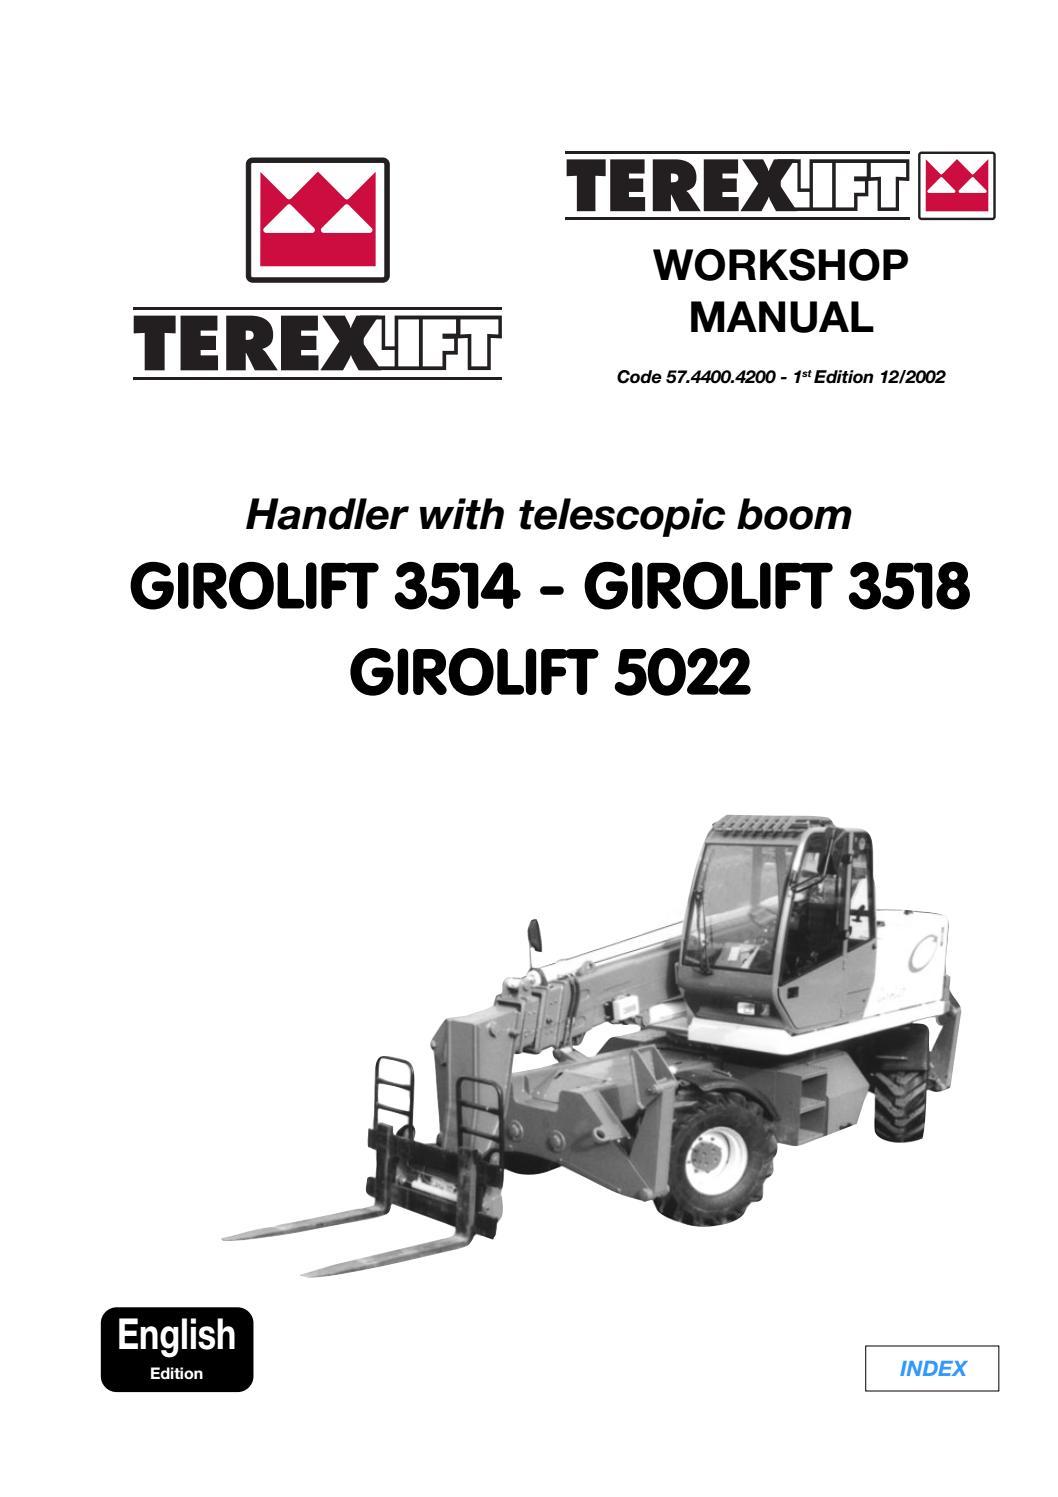 TEREX GIROLIFT 3514 TELESCOPIC HANDLER Service Repair